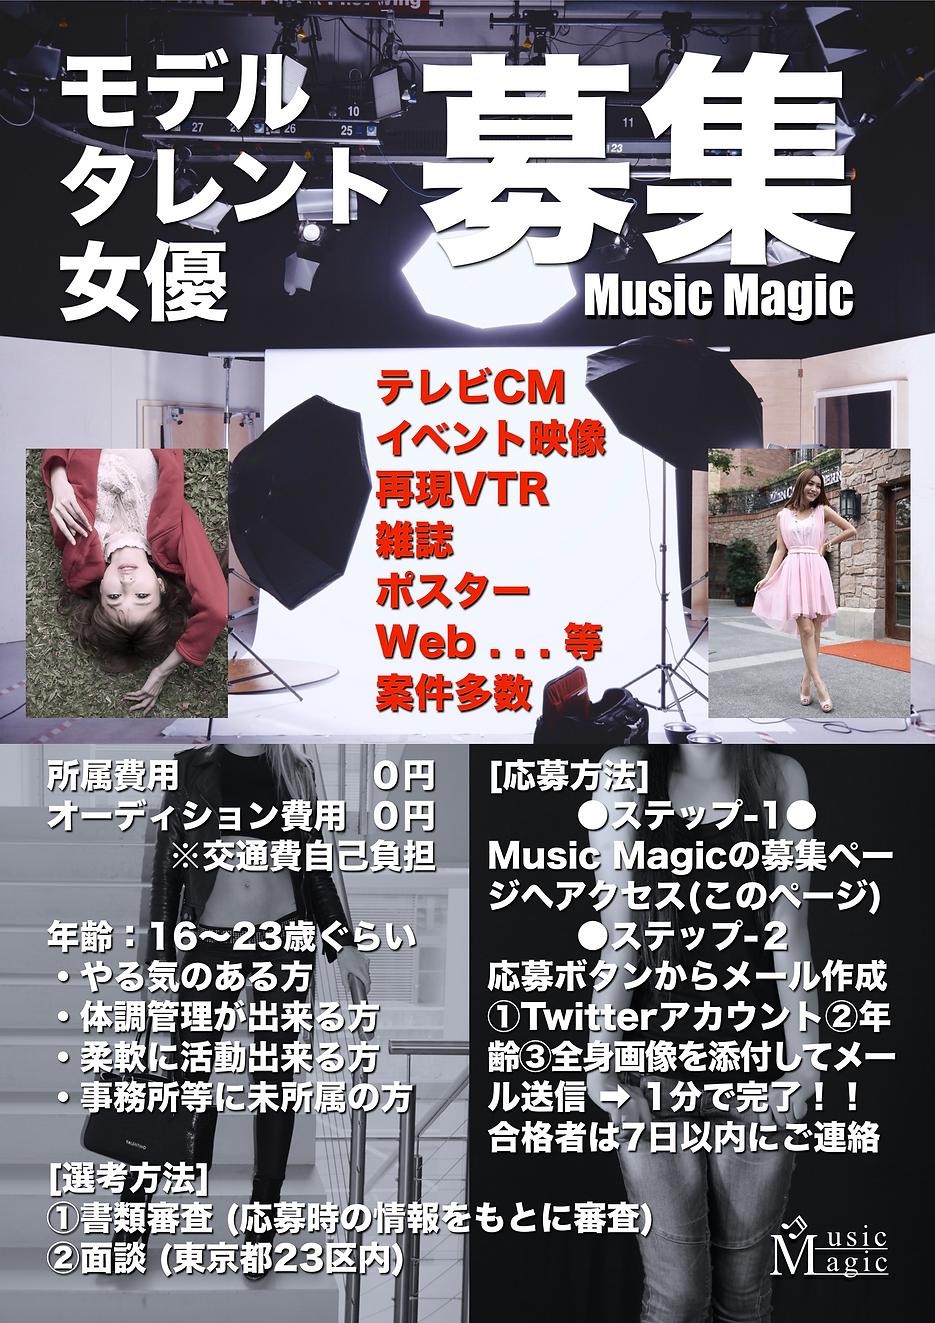 Music Magic タレント 募集 A4大.png